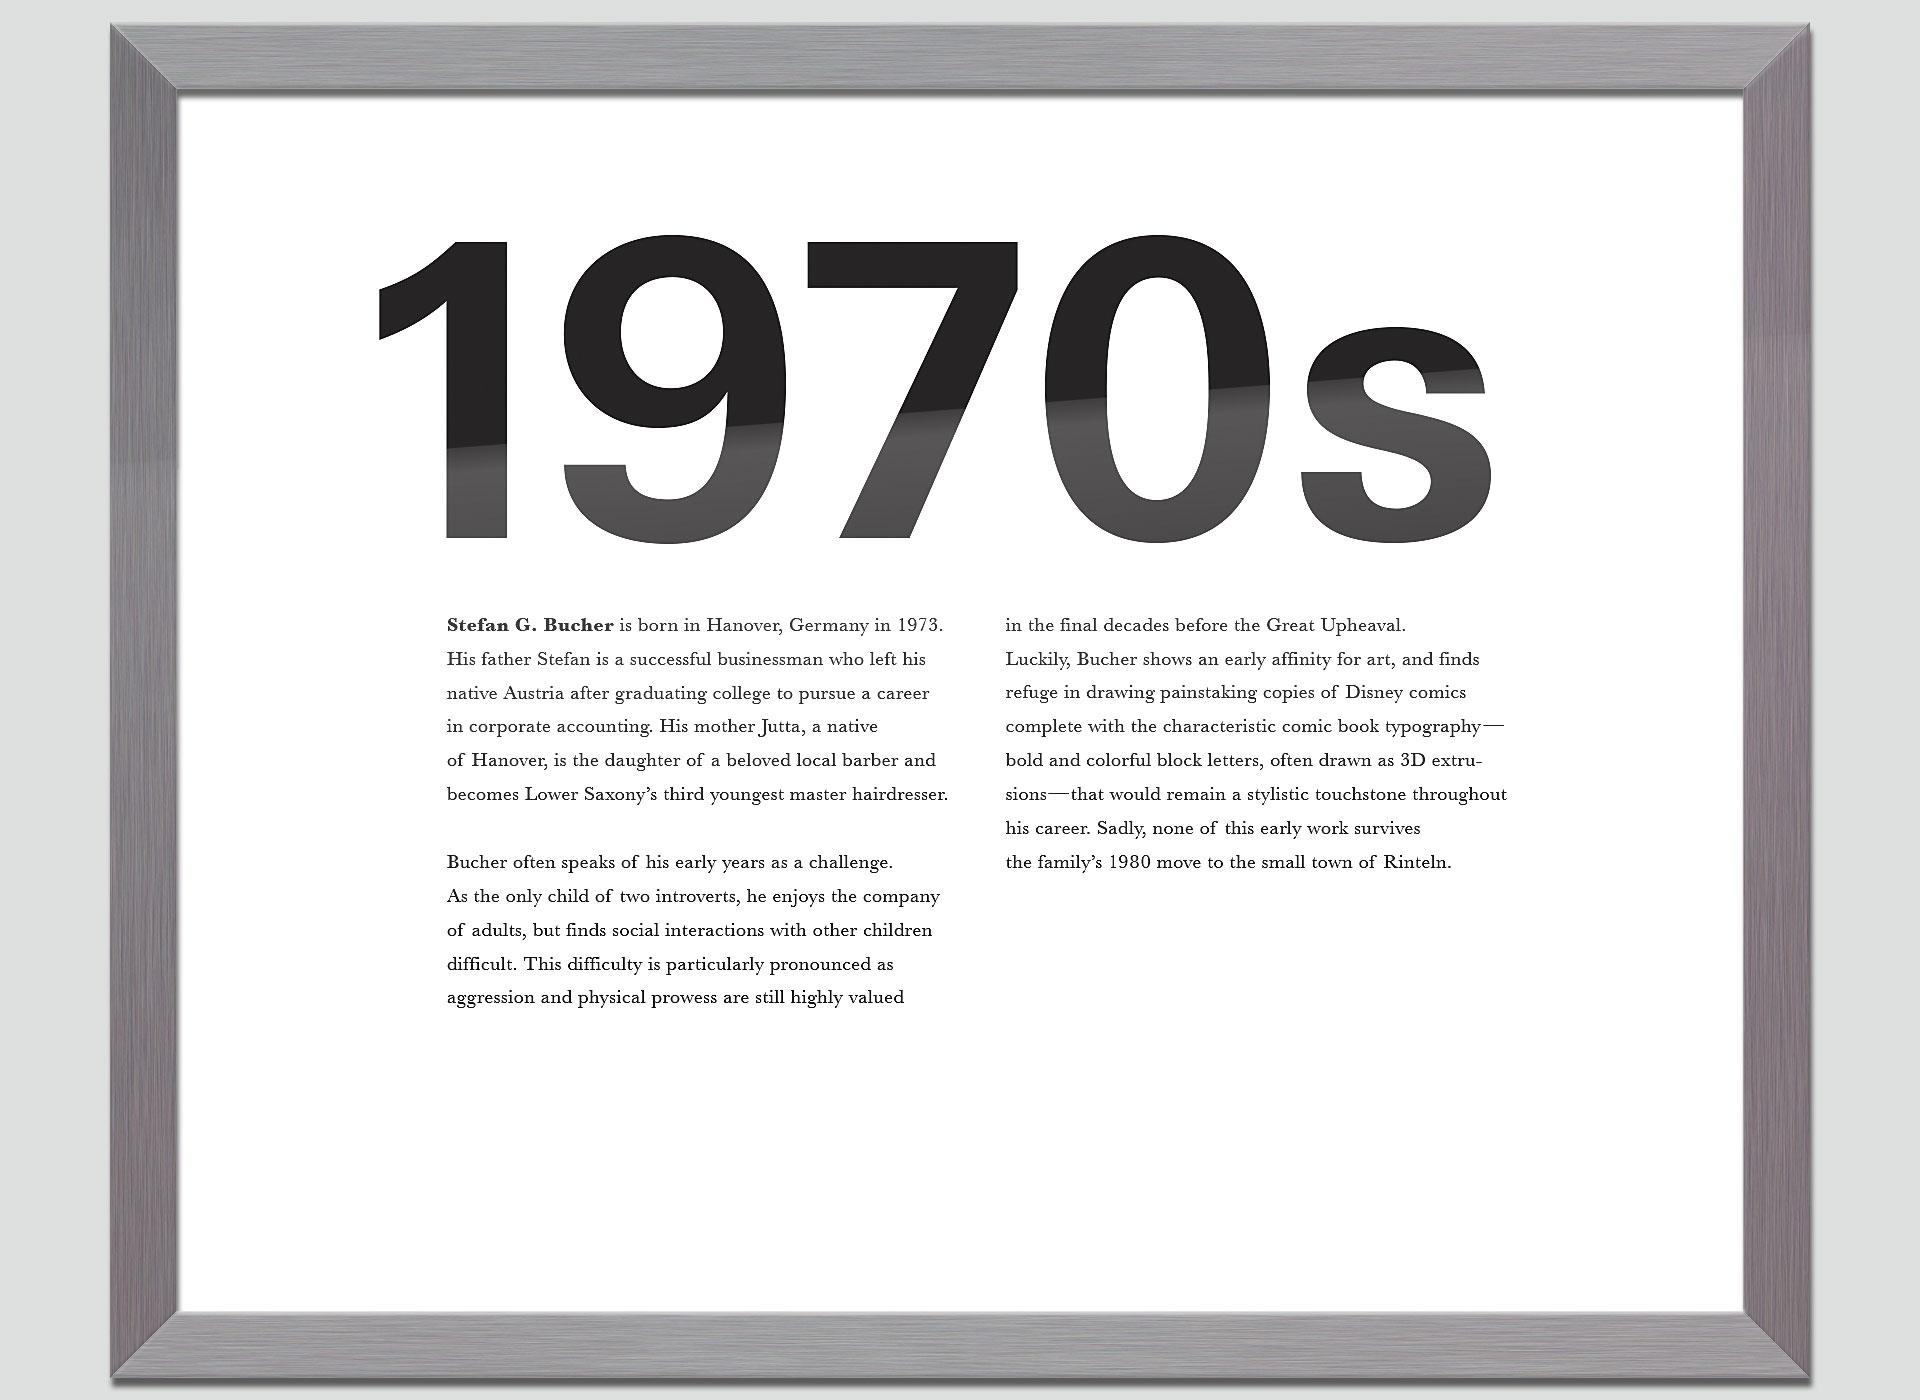 everything-decades-1970@2x.jpg